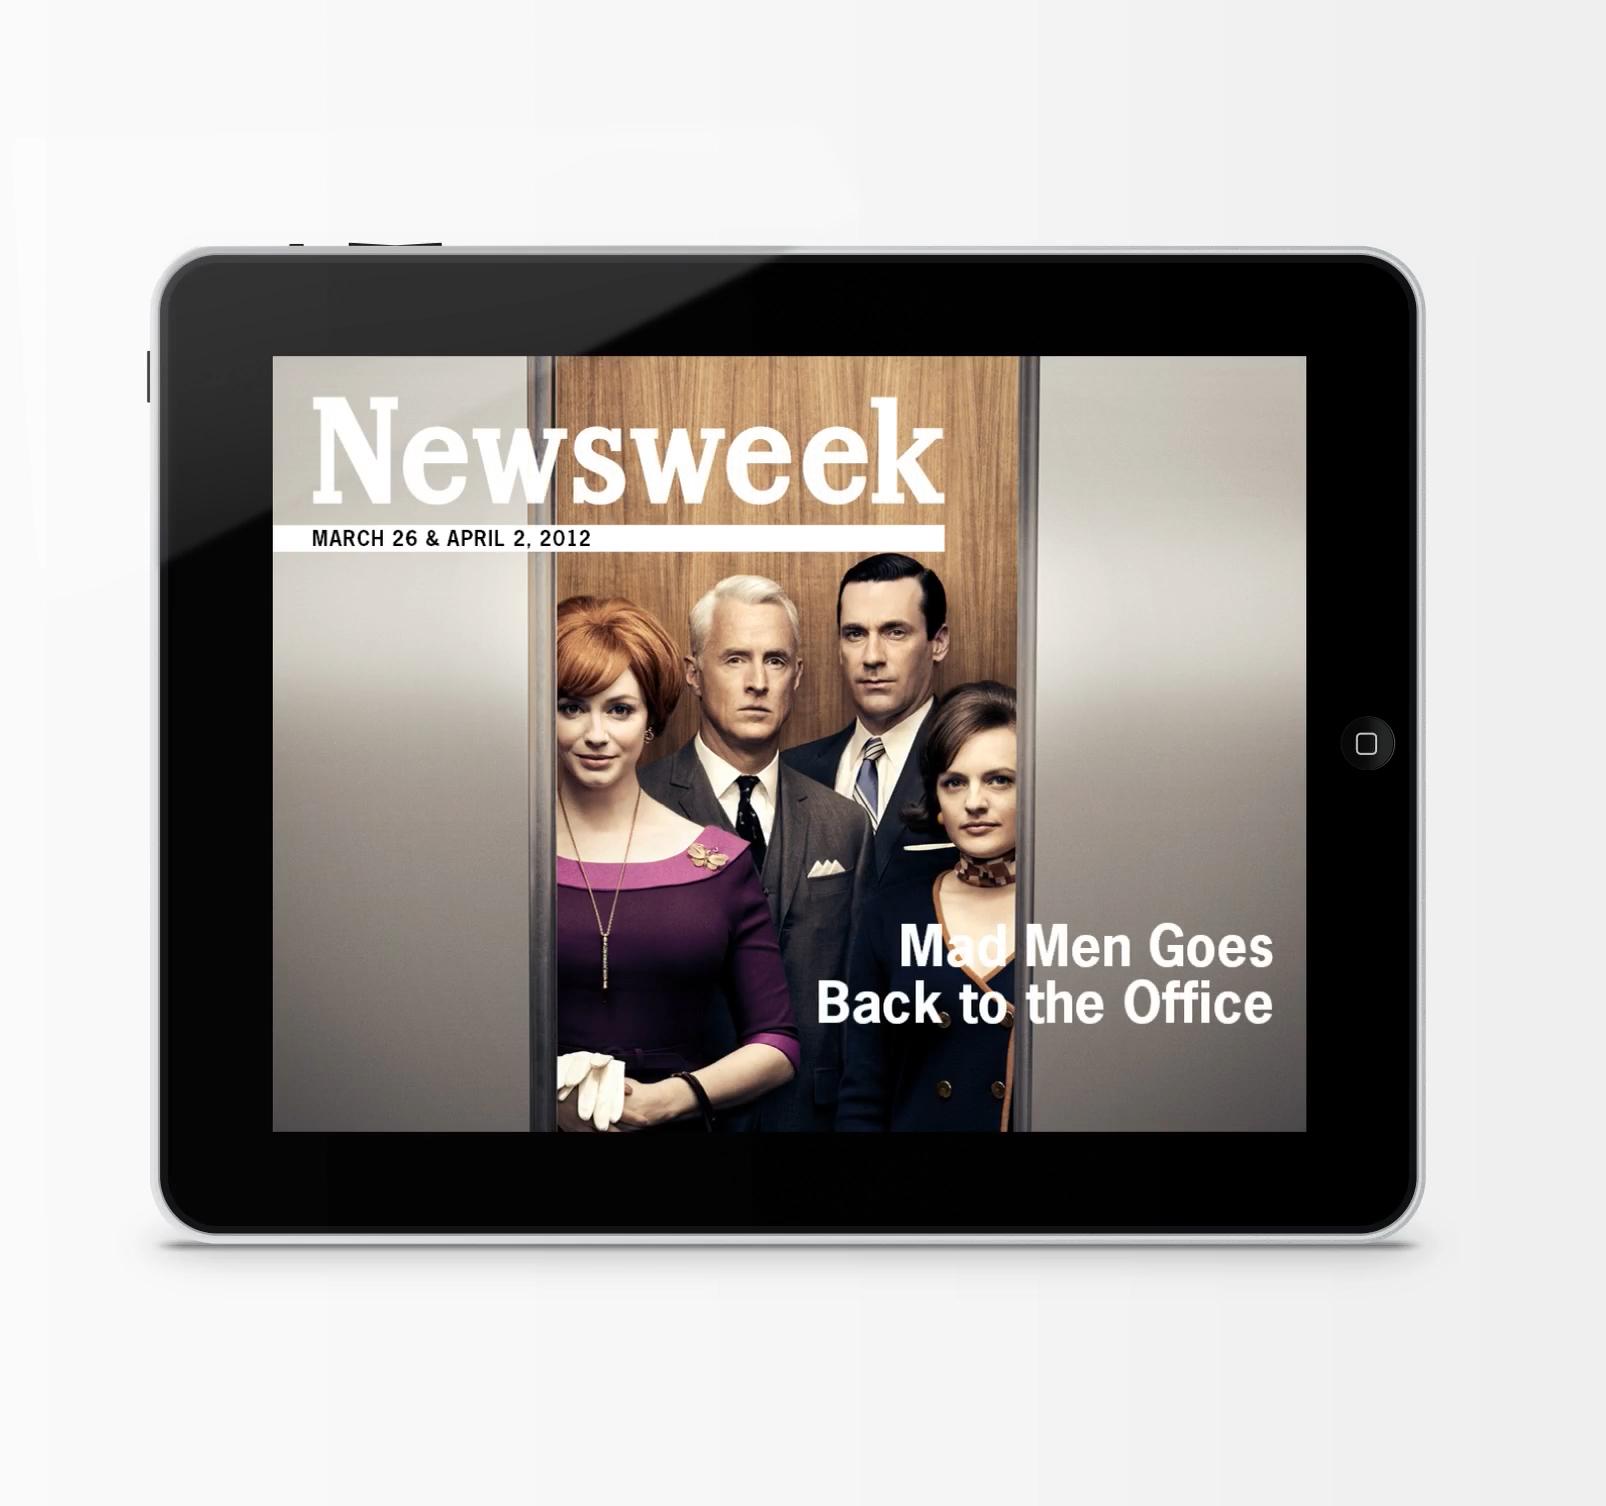 Newsweek Mad Men Cover - Horizontal